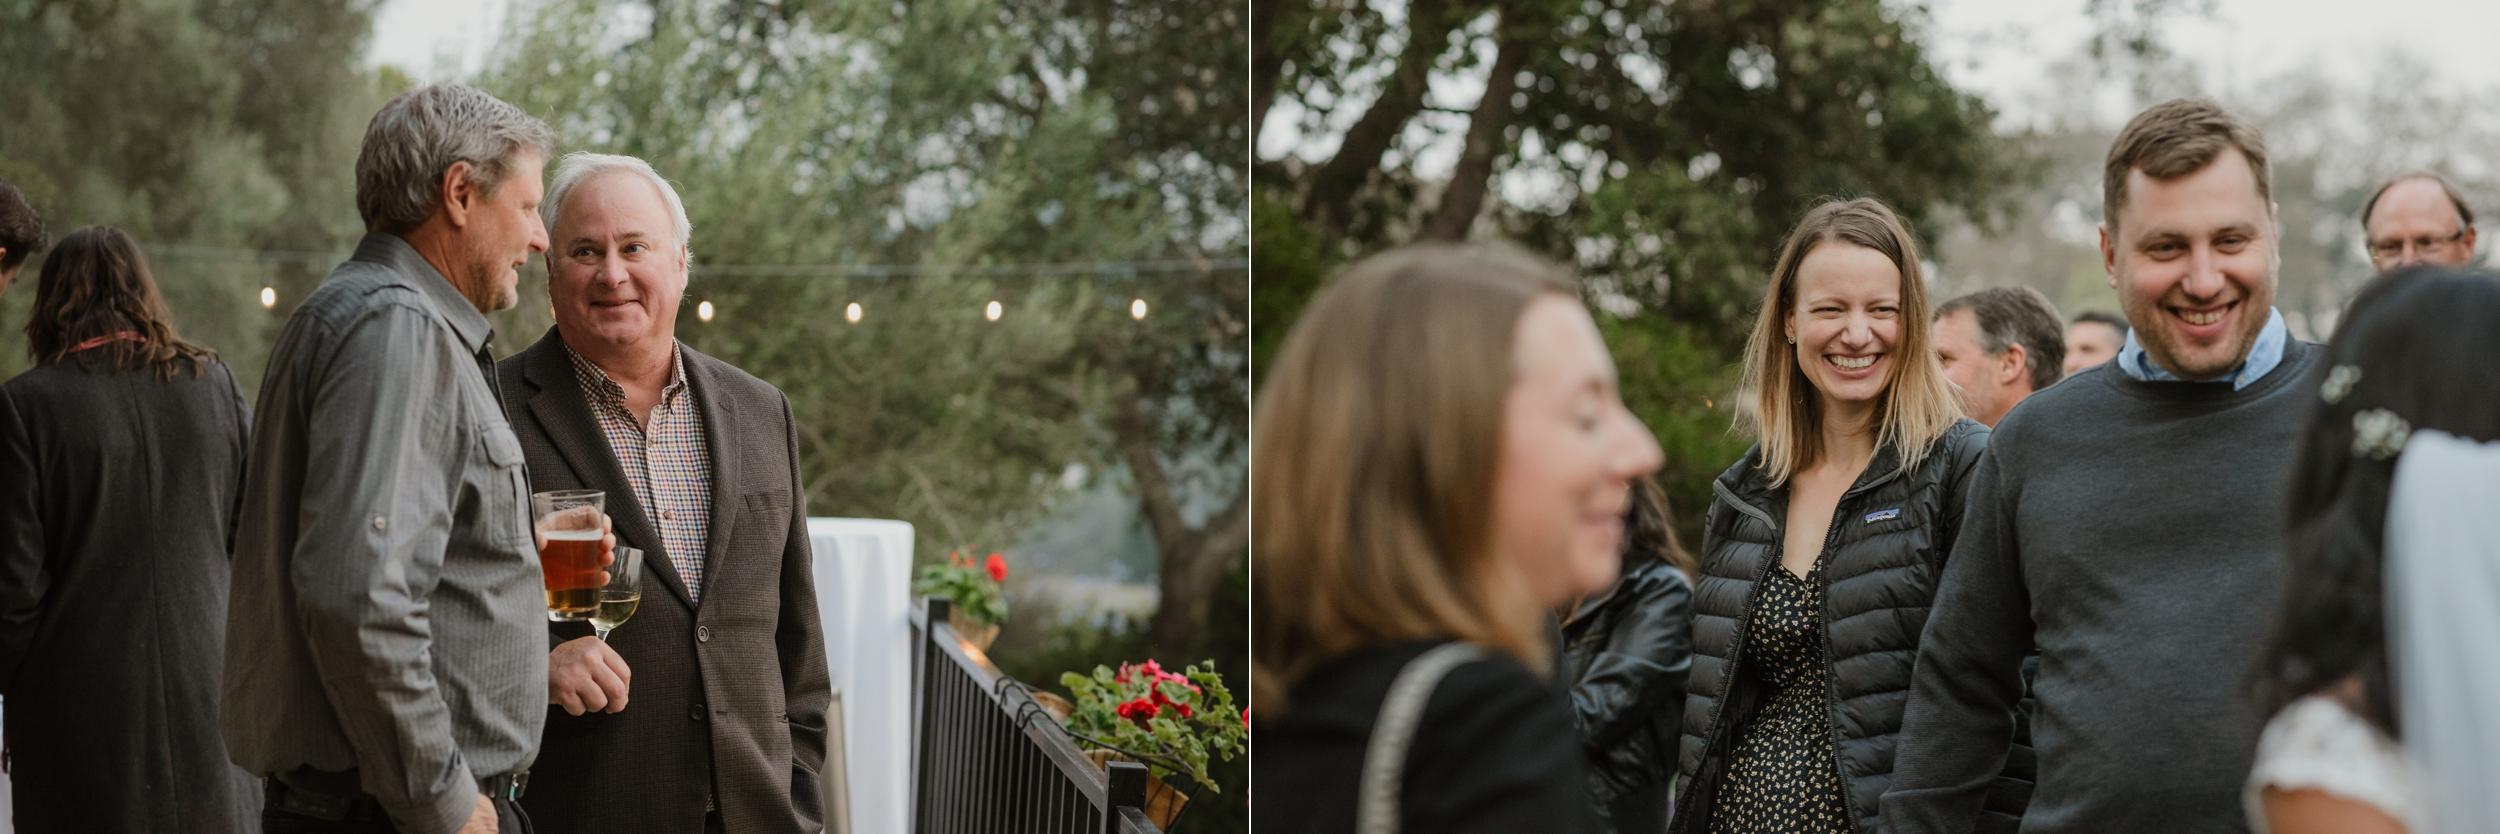 091marin-petaluma-backyard-wedding-vivianchen-561_WEB.jpg